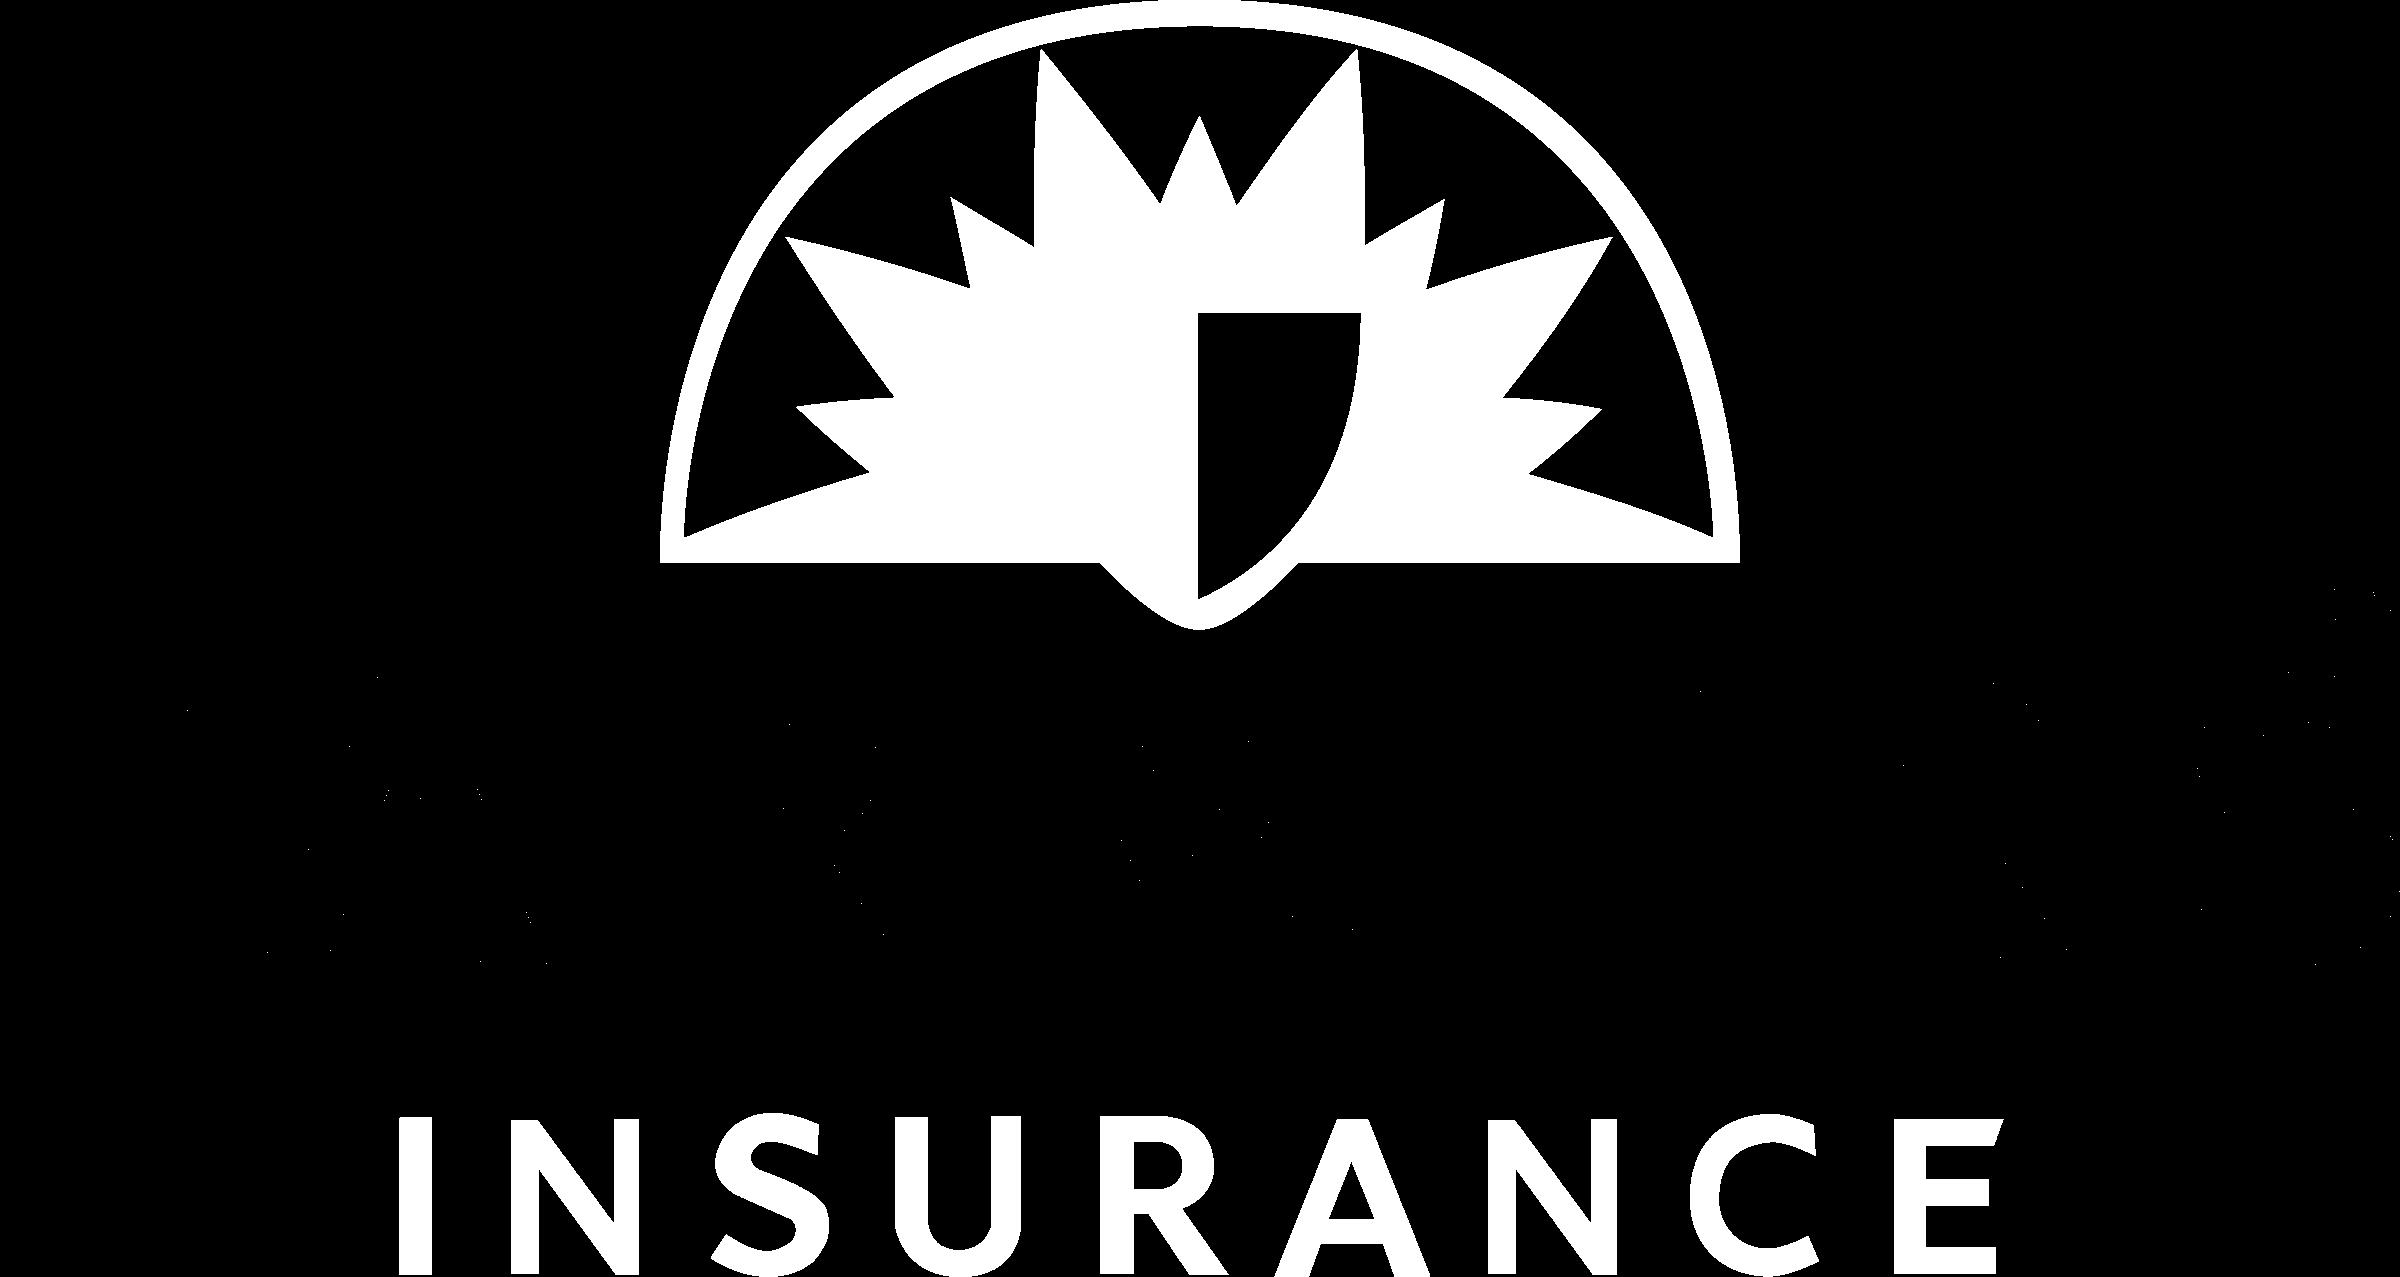 farmers insurance logo png transparent & svg vector - freebie supply  freebie supply